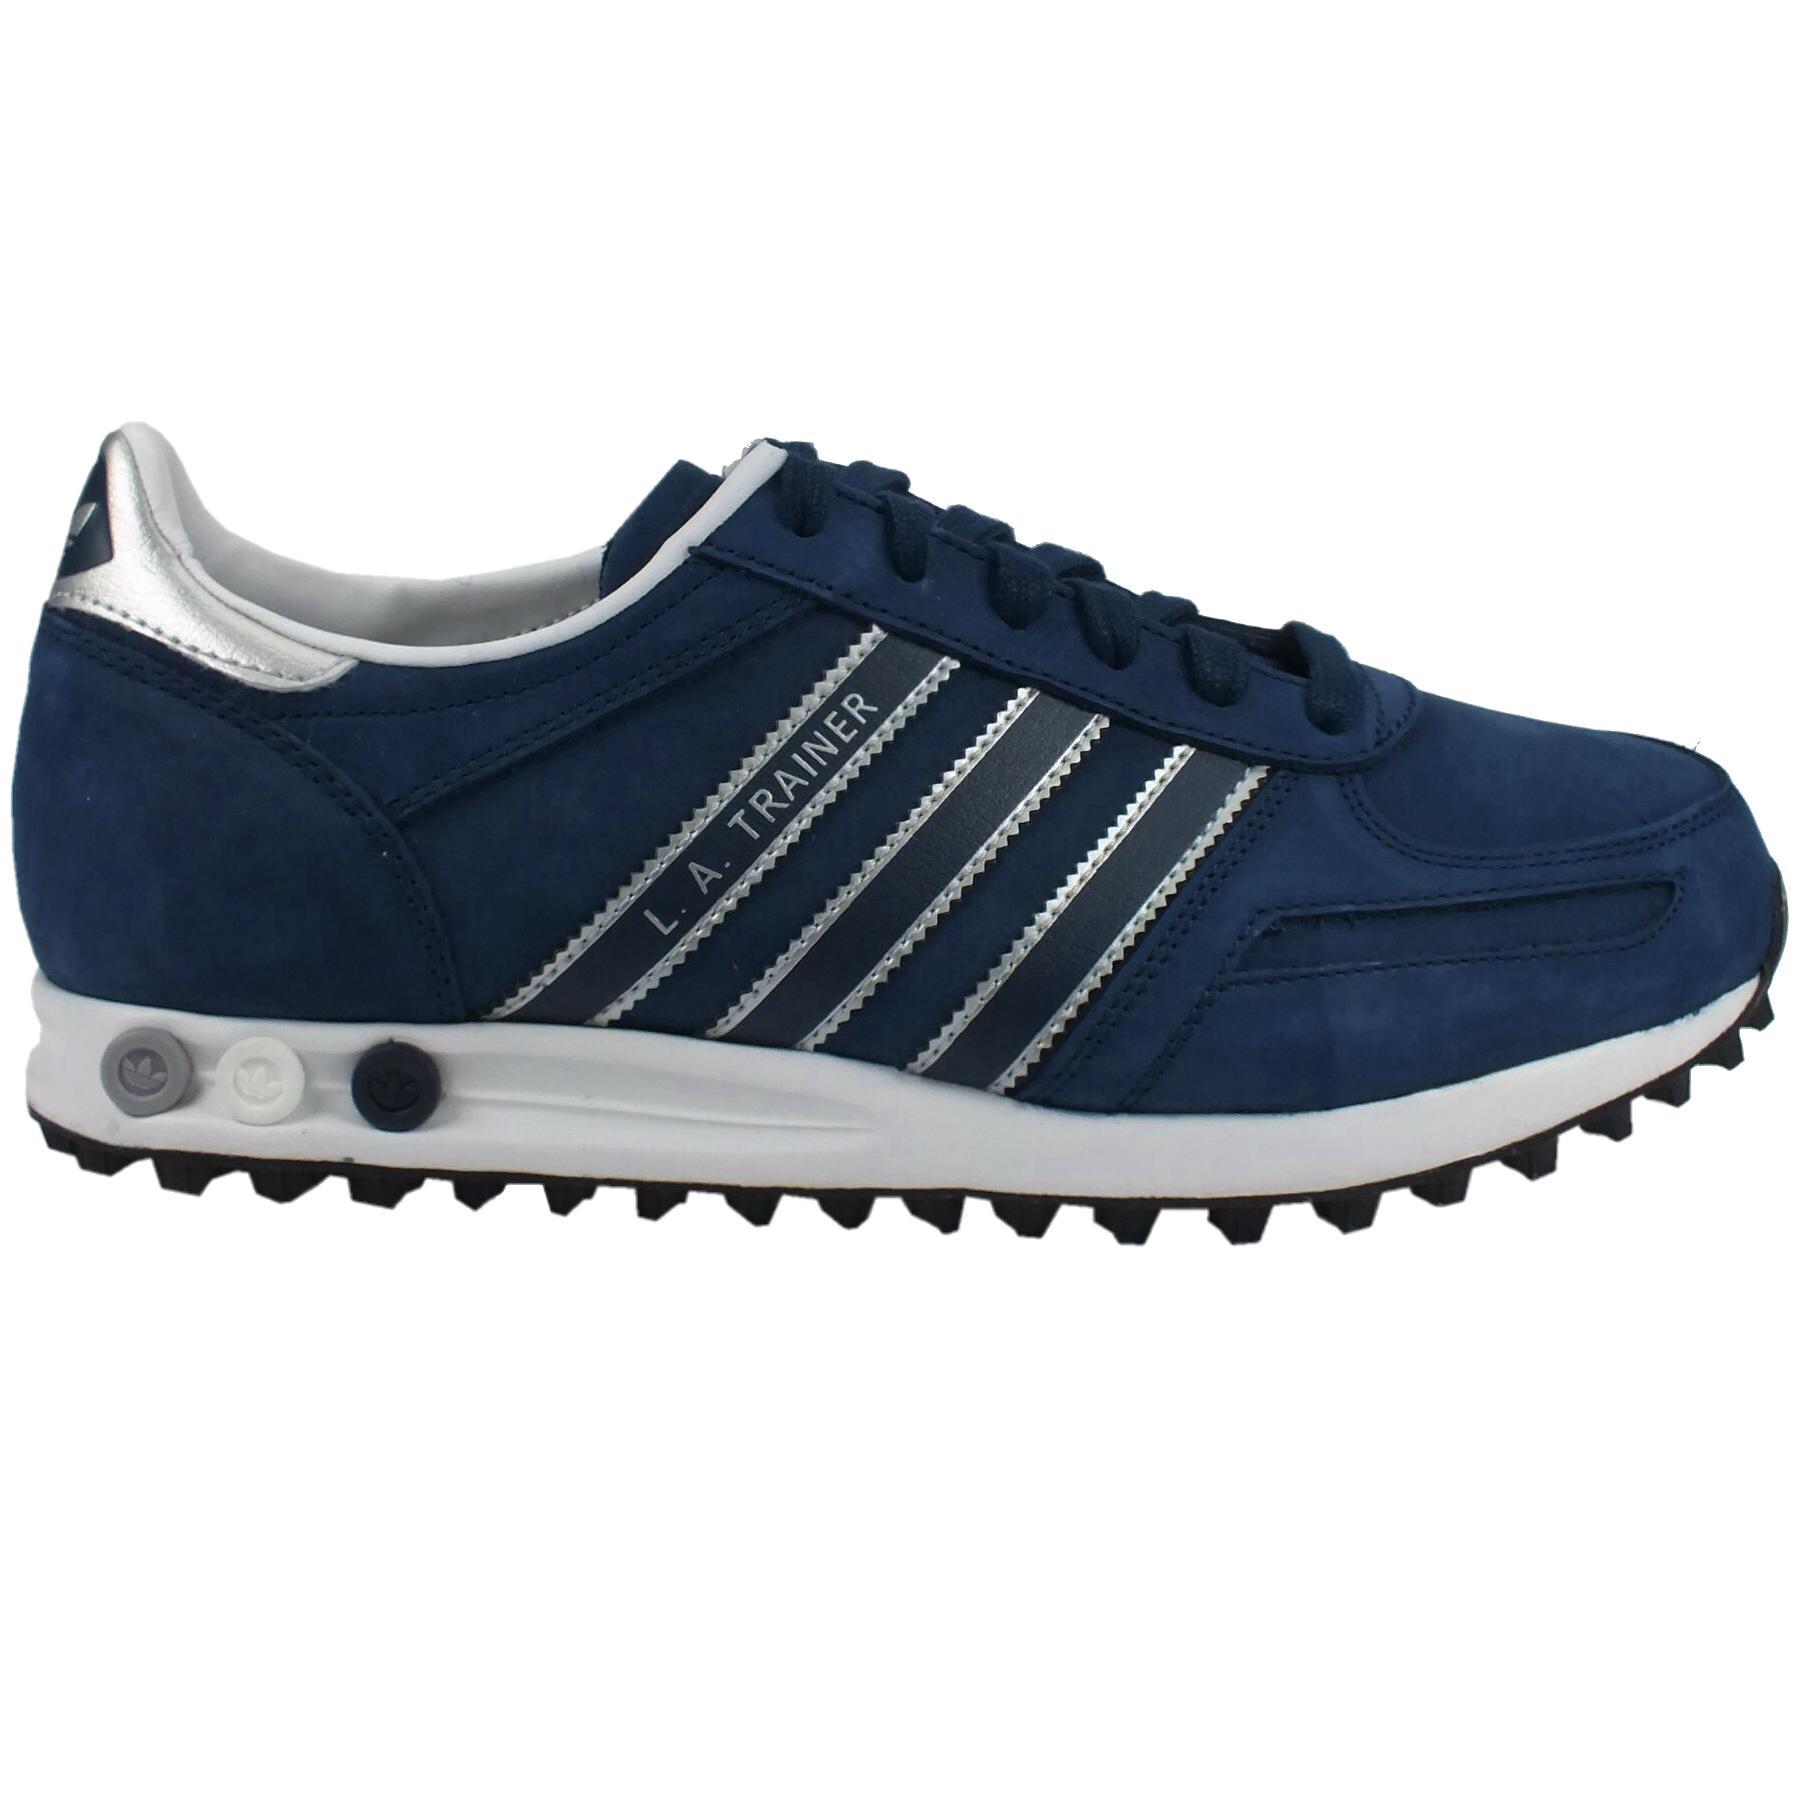 adidas originals la trainer schuhe sneaker herren damen. Black Bedroom Furniture Sets. Home Design Ideas